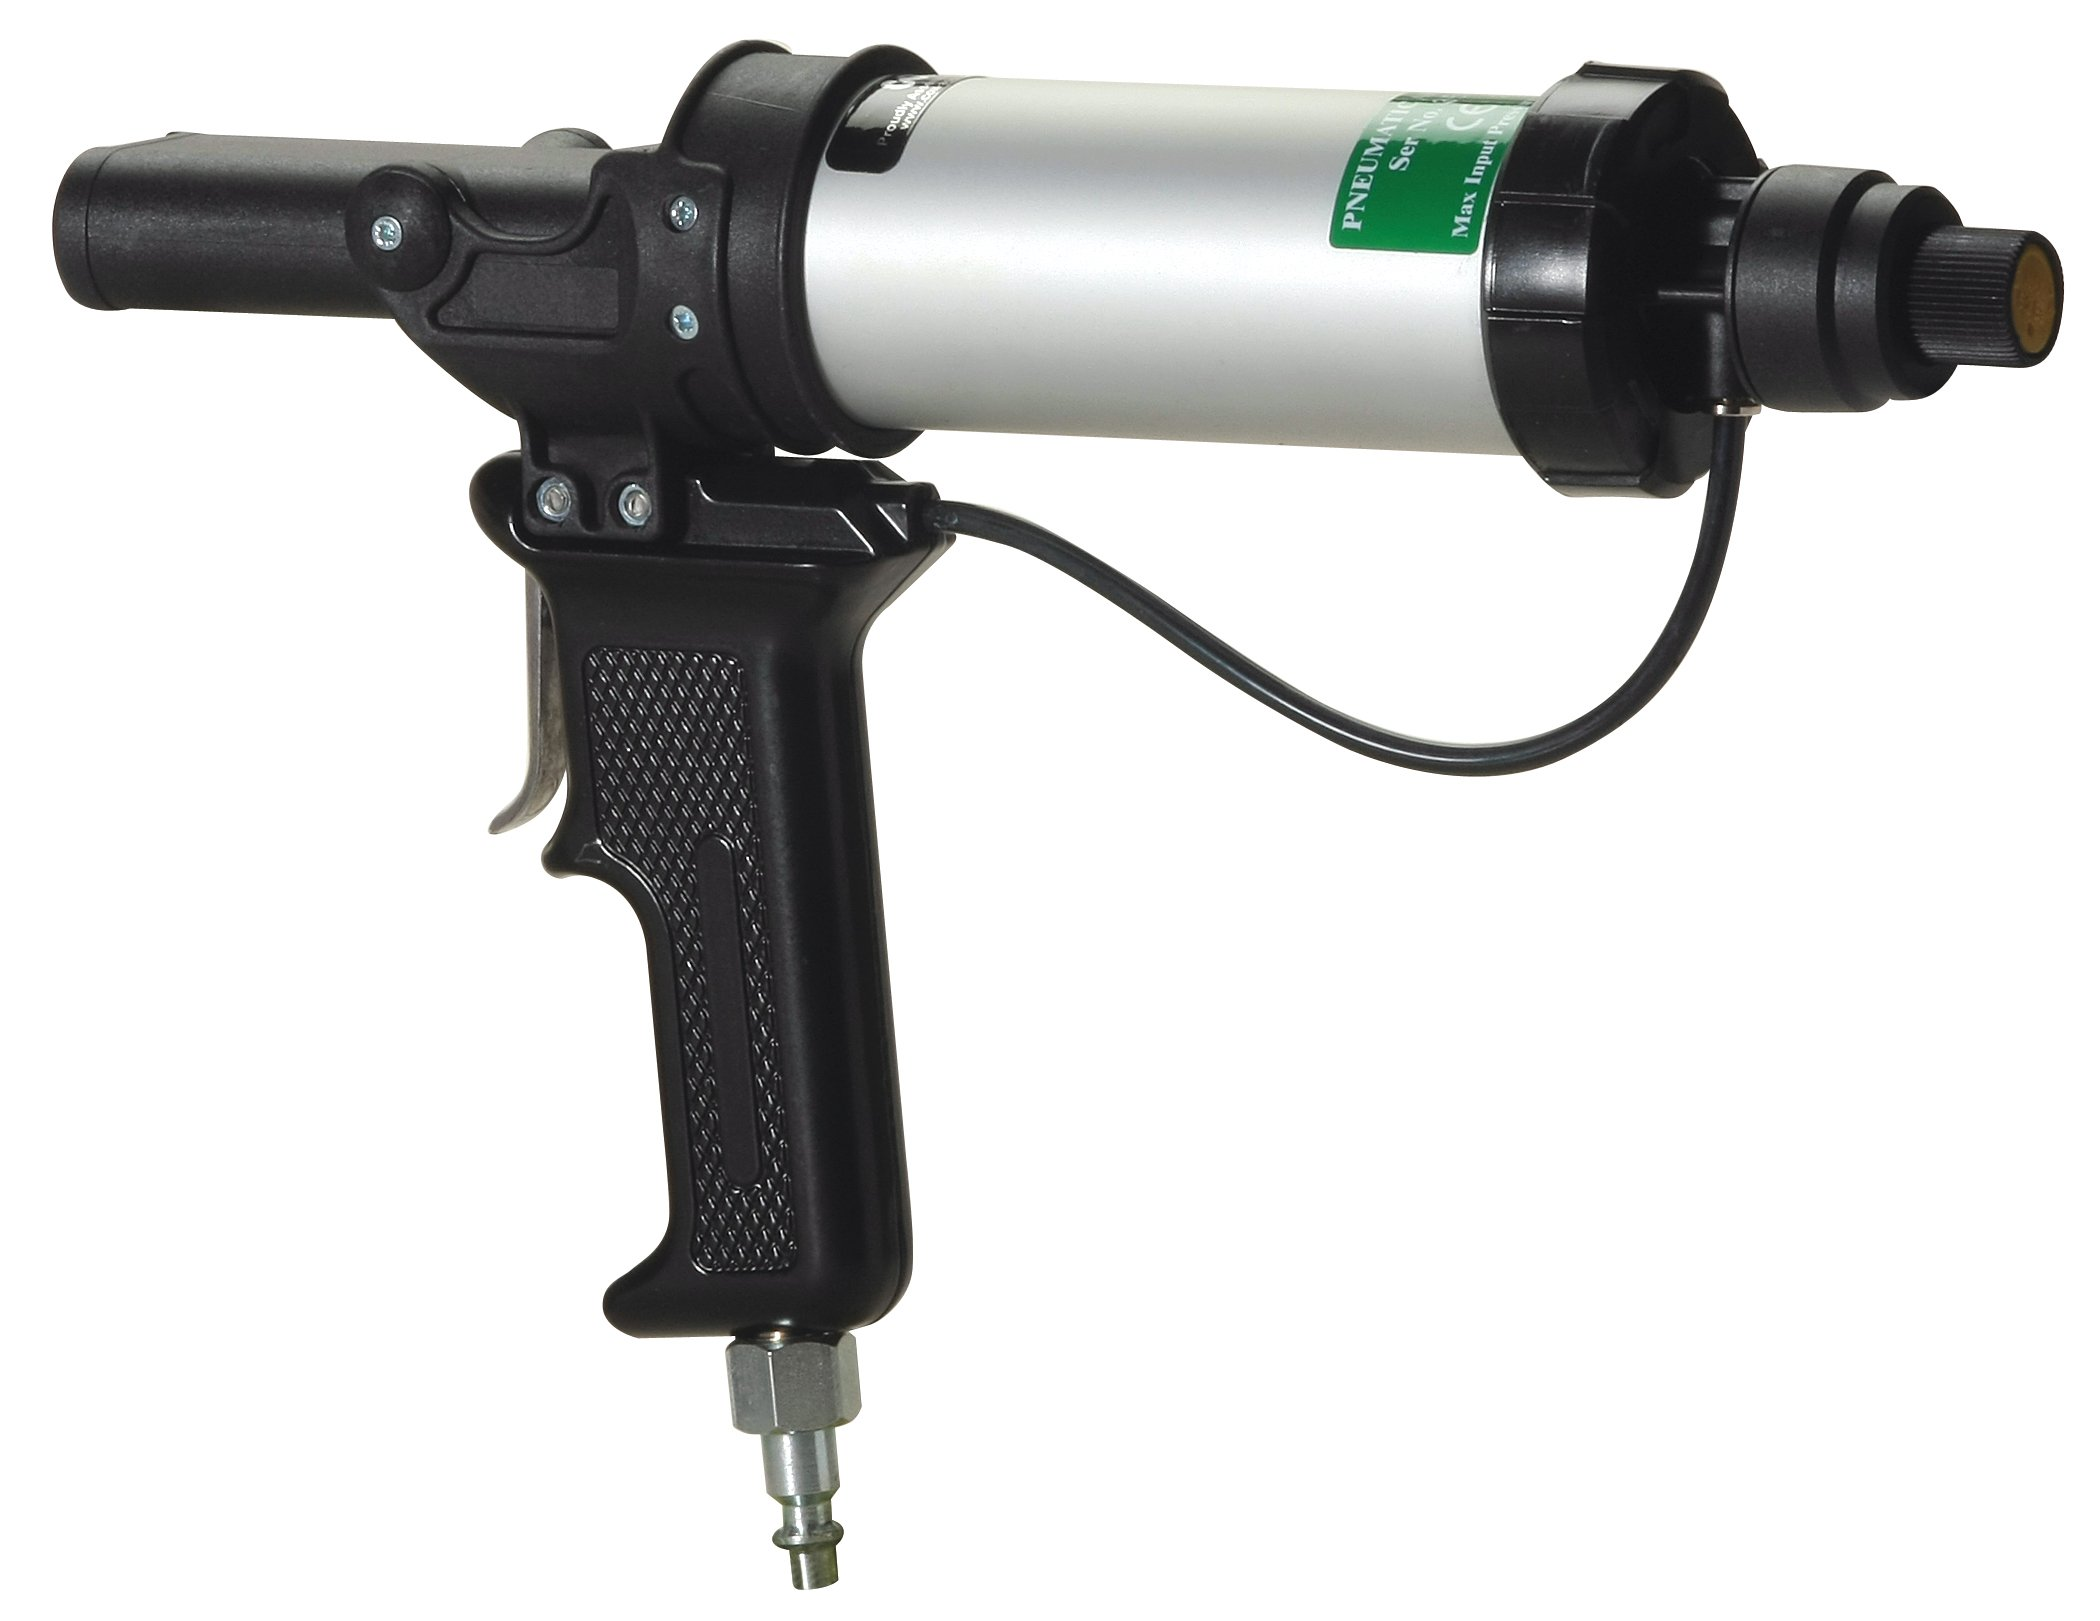 COX A25 25 ml. x 25 ml. Cartridge Pneumatic Epoxy Applicator by COX